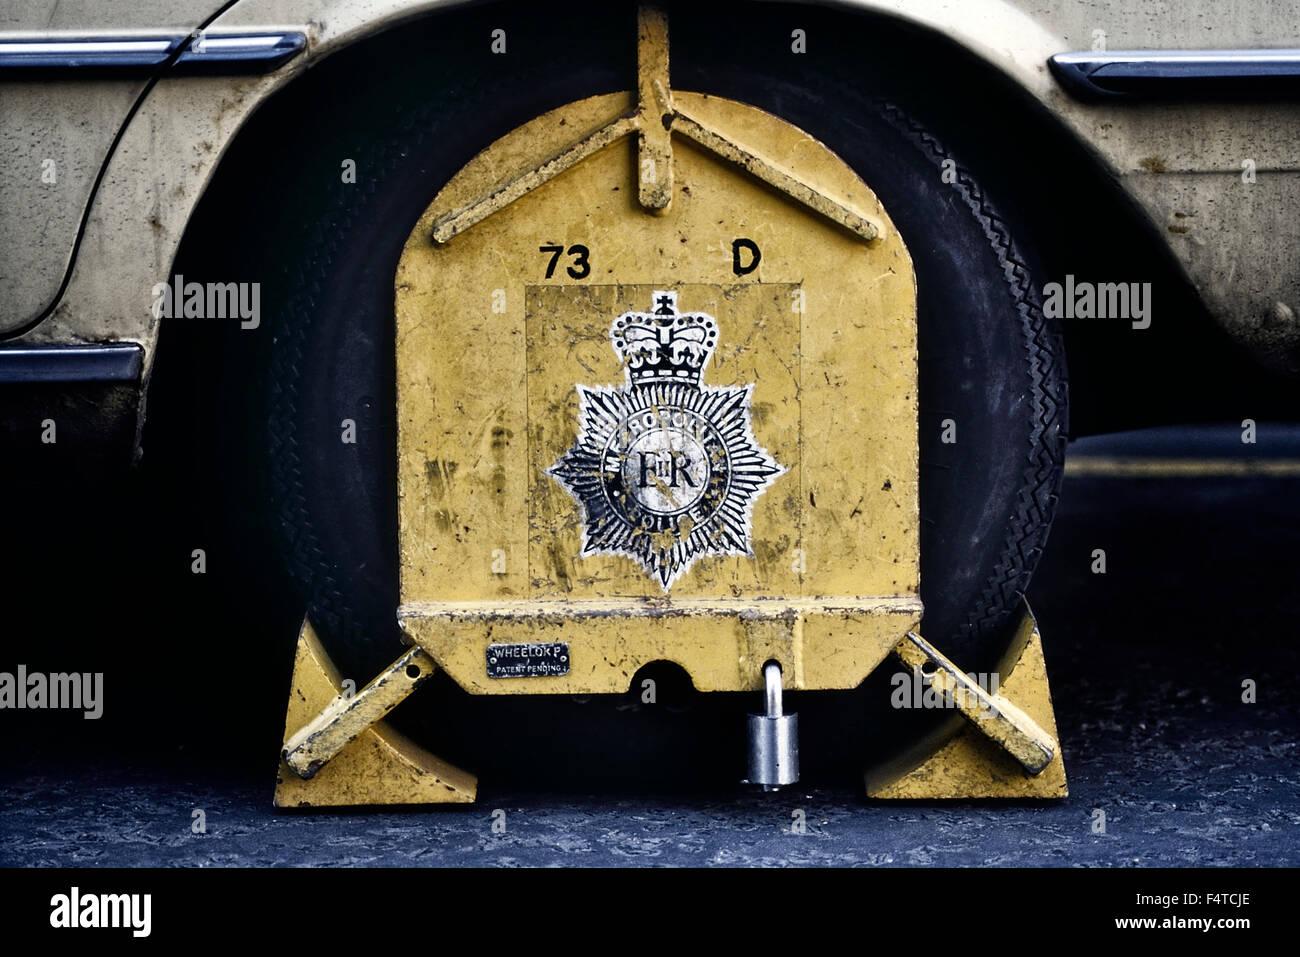 Metropolitan Police wheel clamp. London, UK Circa 1980's - Stock Image